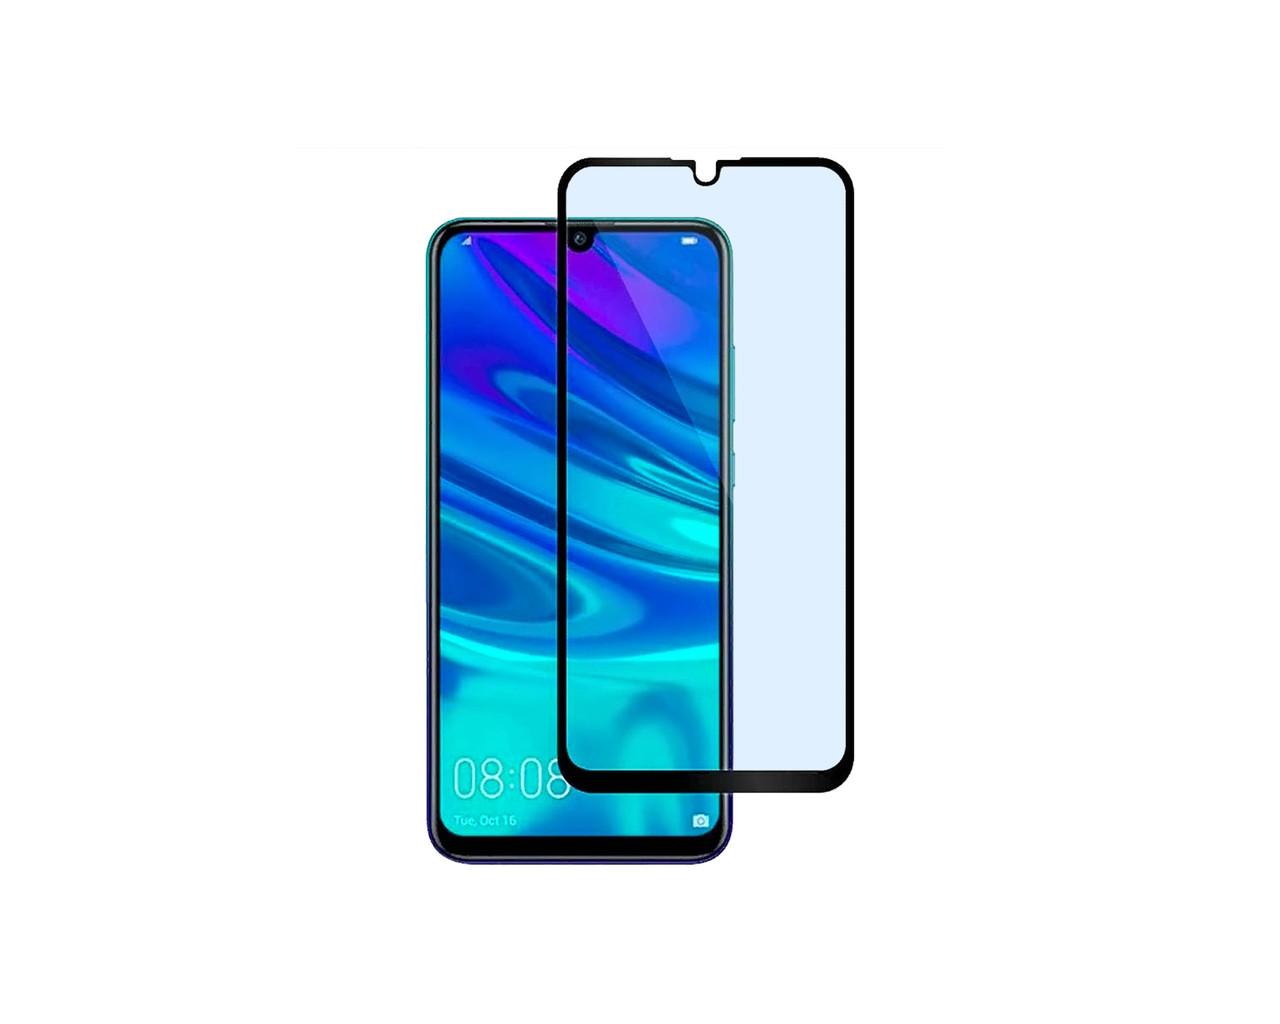 Захисне 3D скло Full Cover для Huawei P Smart+ 2019 Чорний (2448)